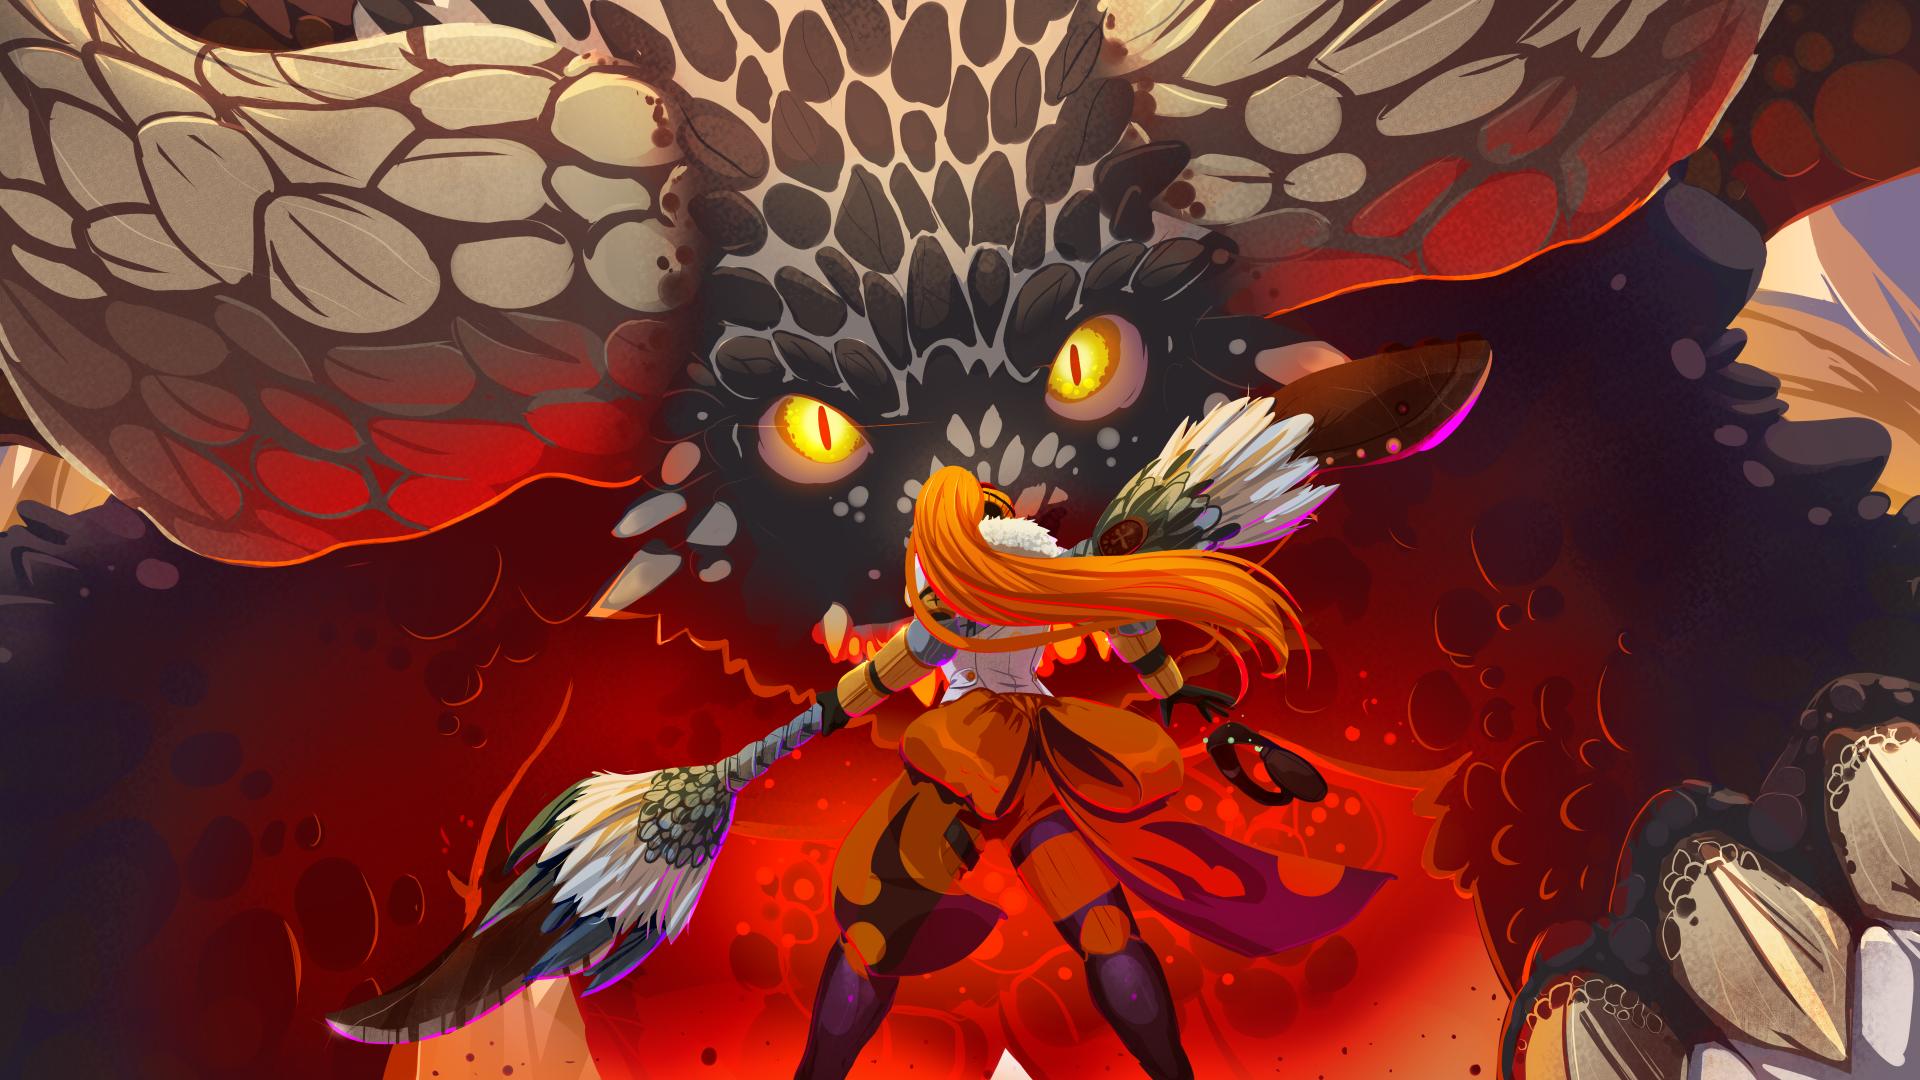 Monster hunter nergigante by drowtales